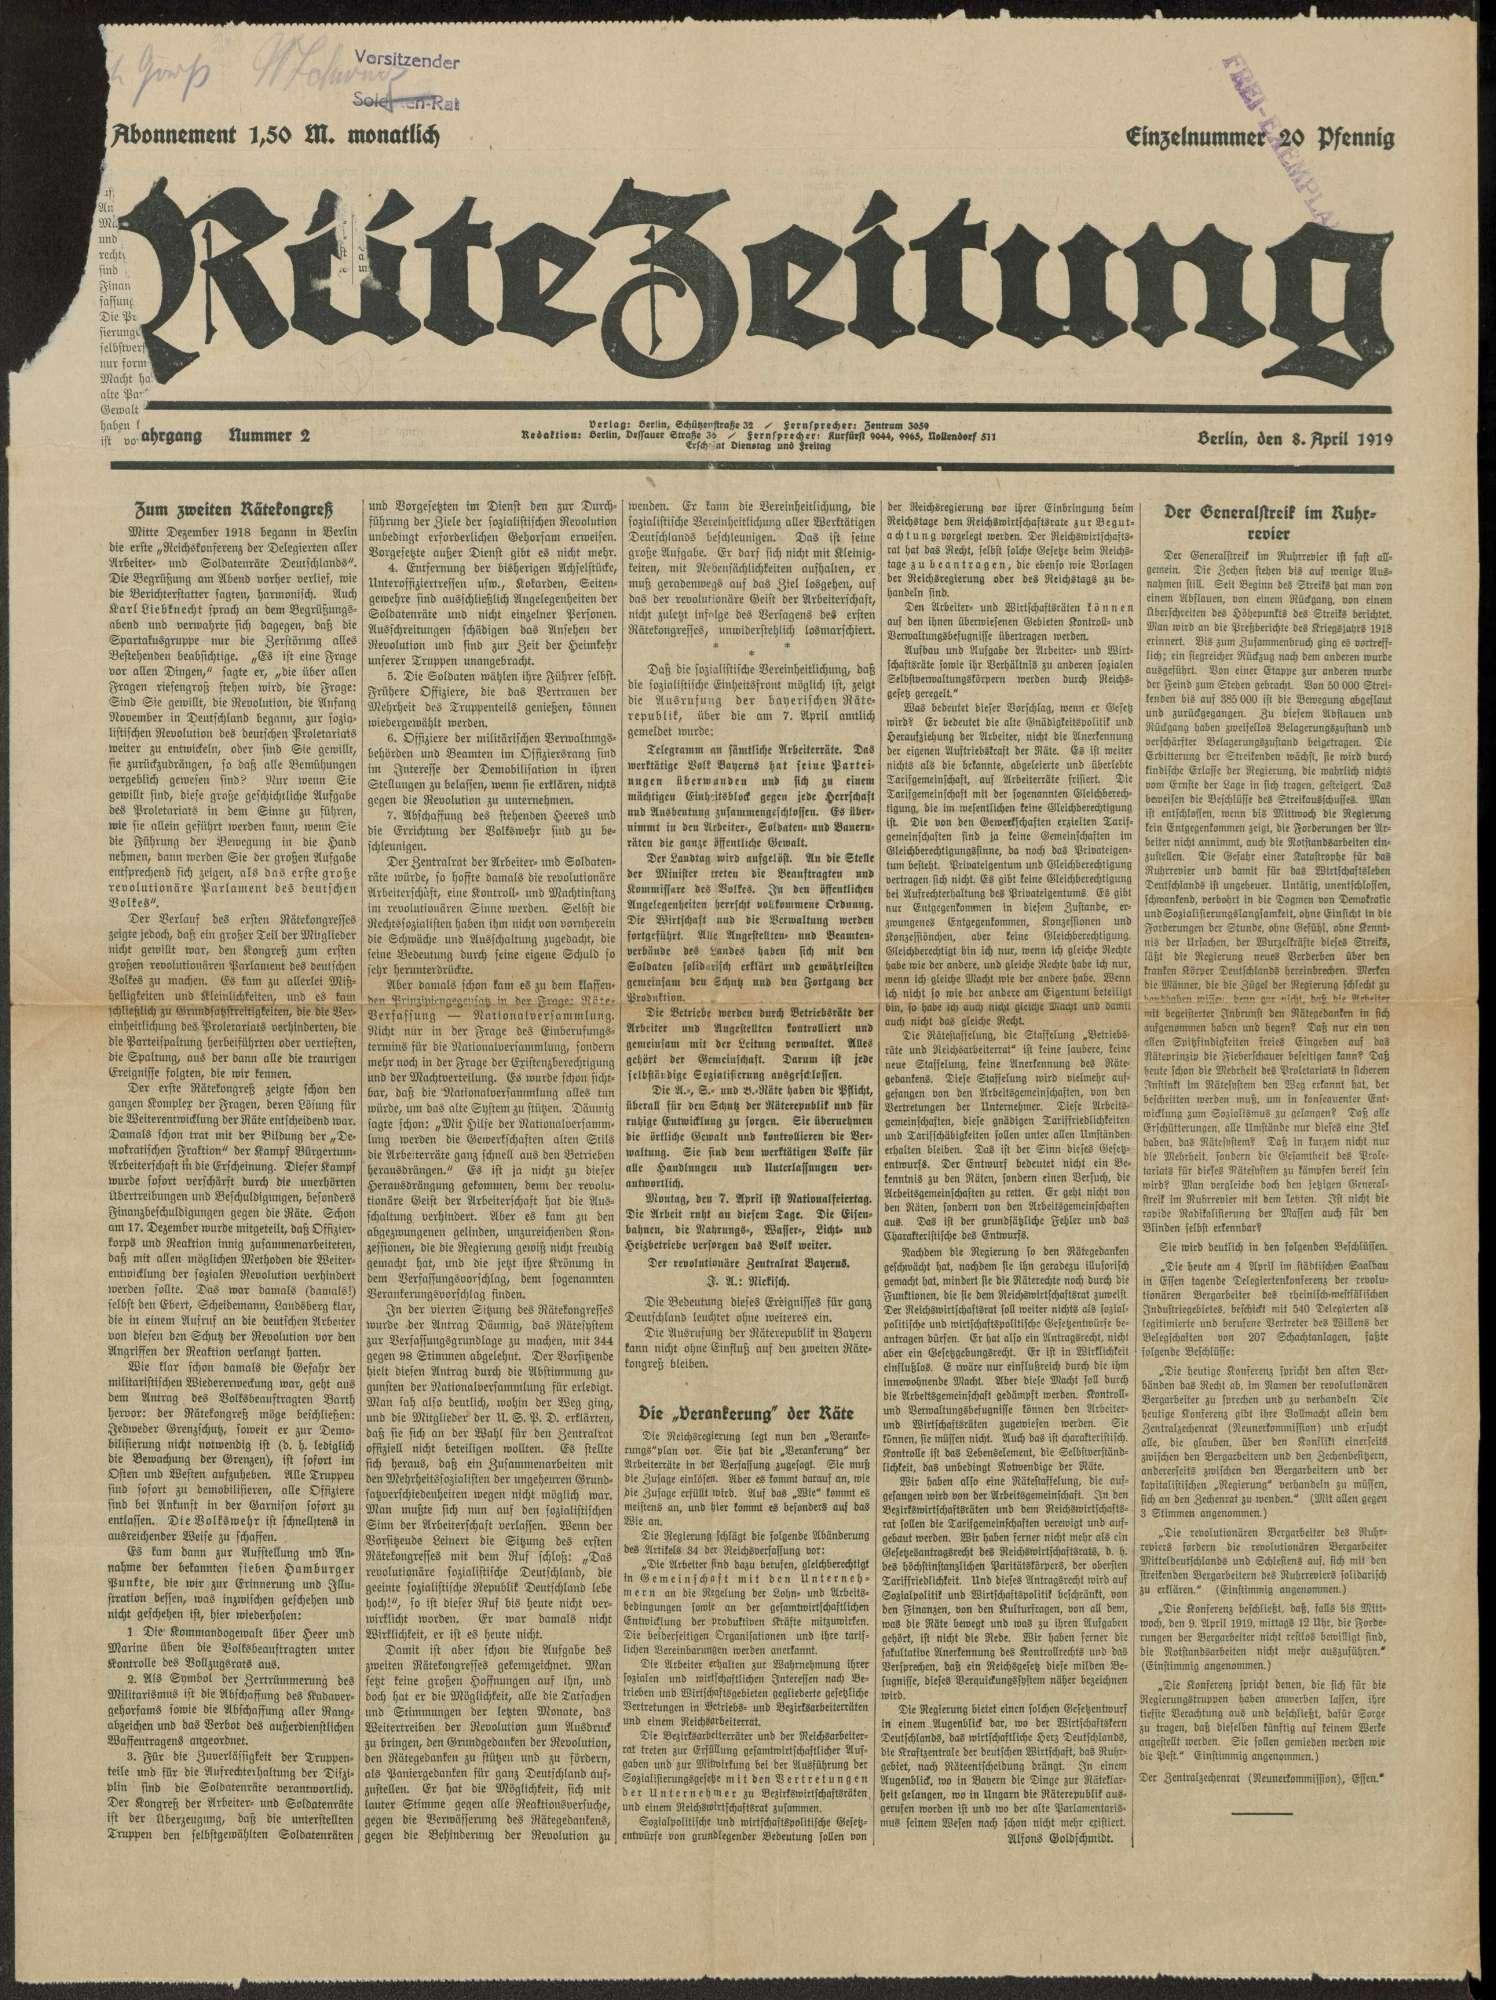 Rätezeitung, Bild 1